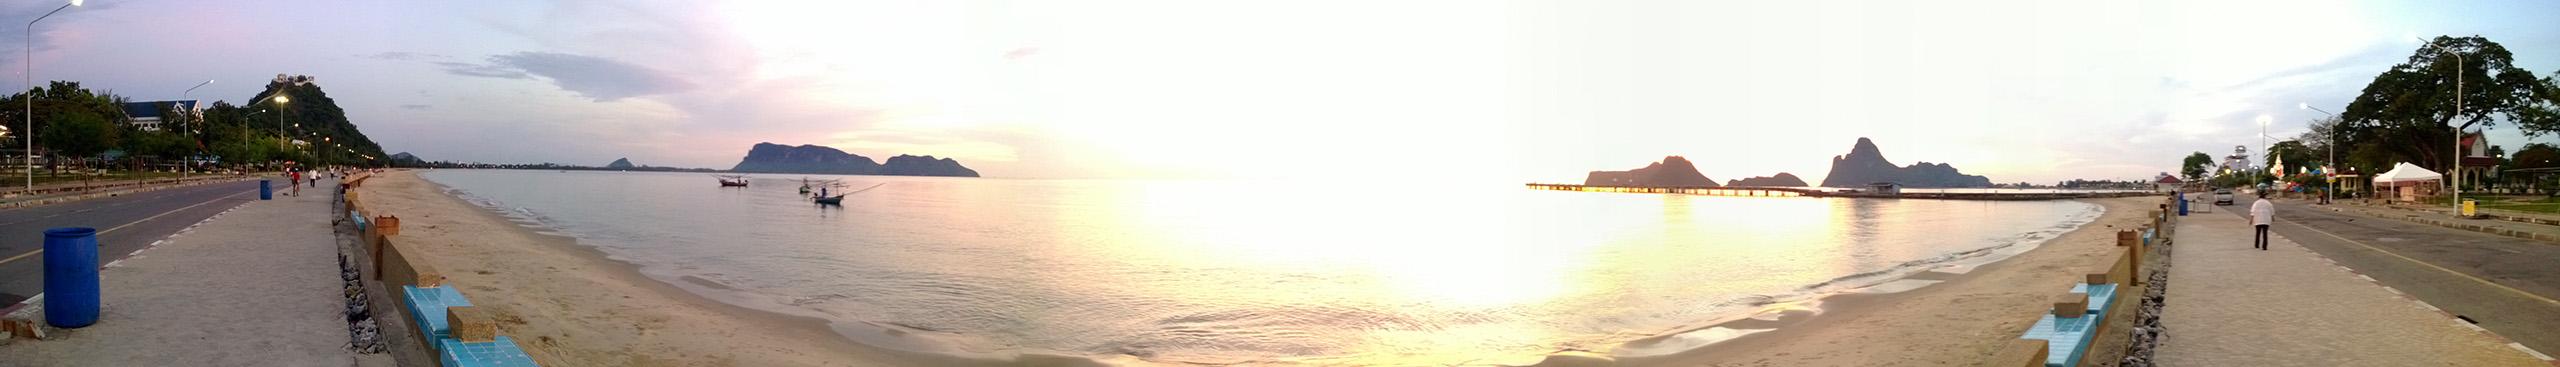 Lumia 920 20121124 06 14 20 Panorama3